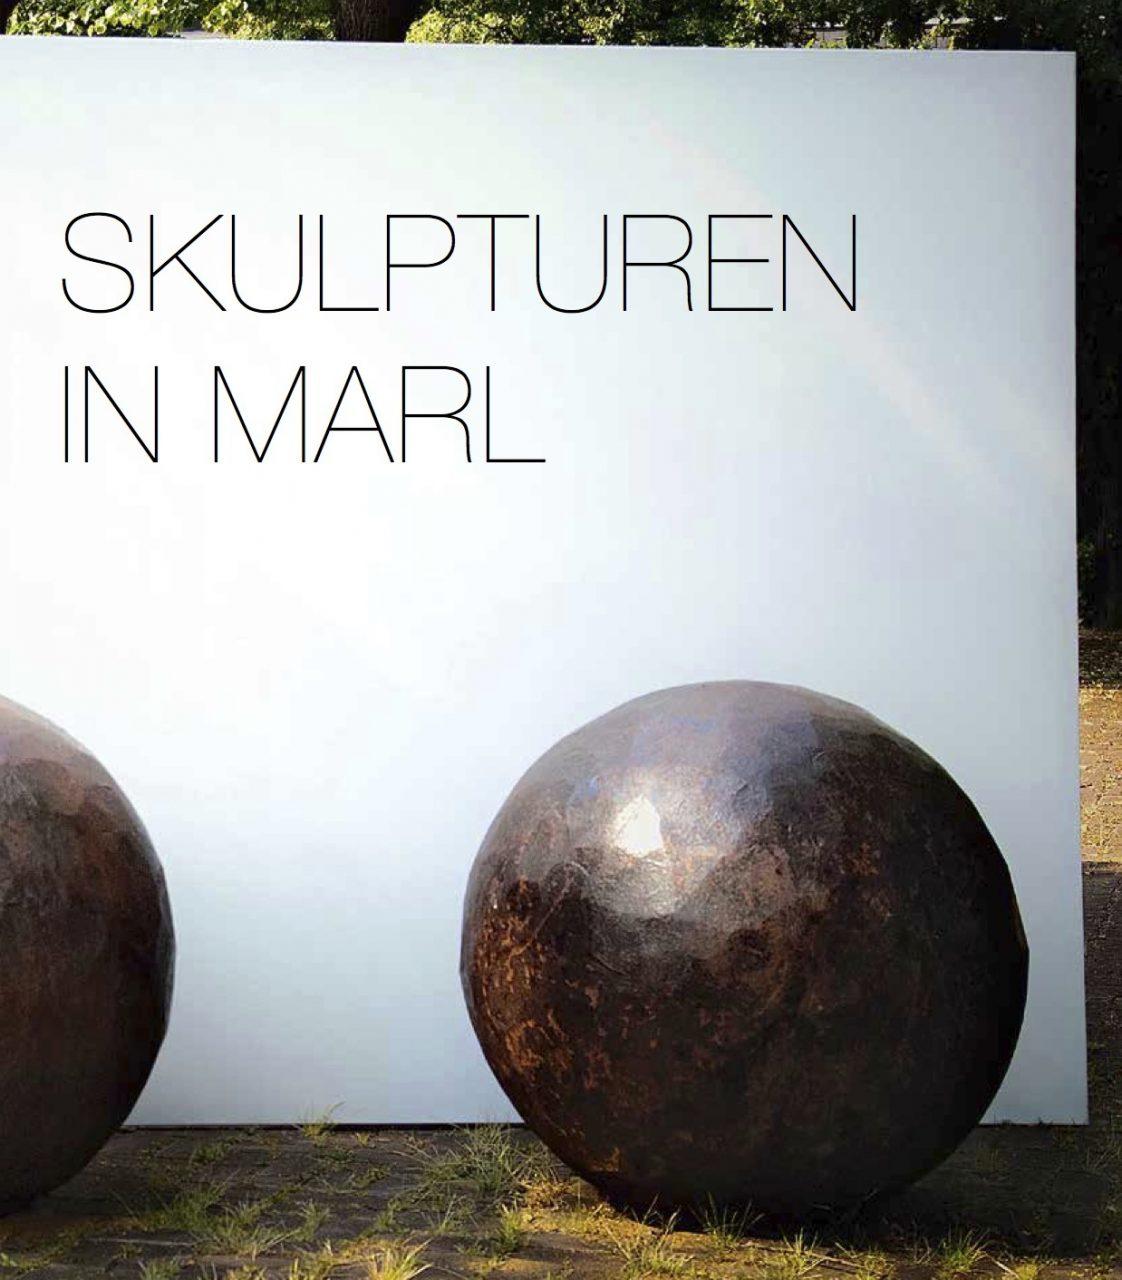 Skulpturen in Marl / Scultpures in Marl. Published by Wienand Verlag Köln